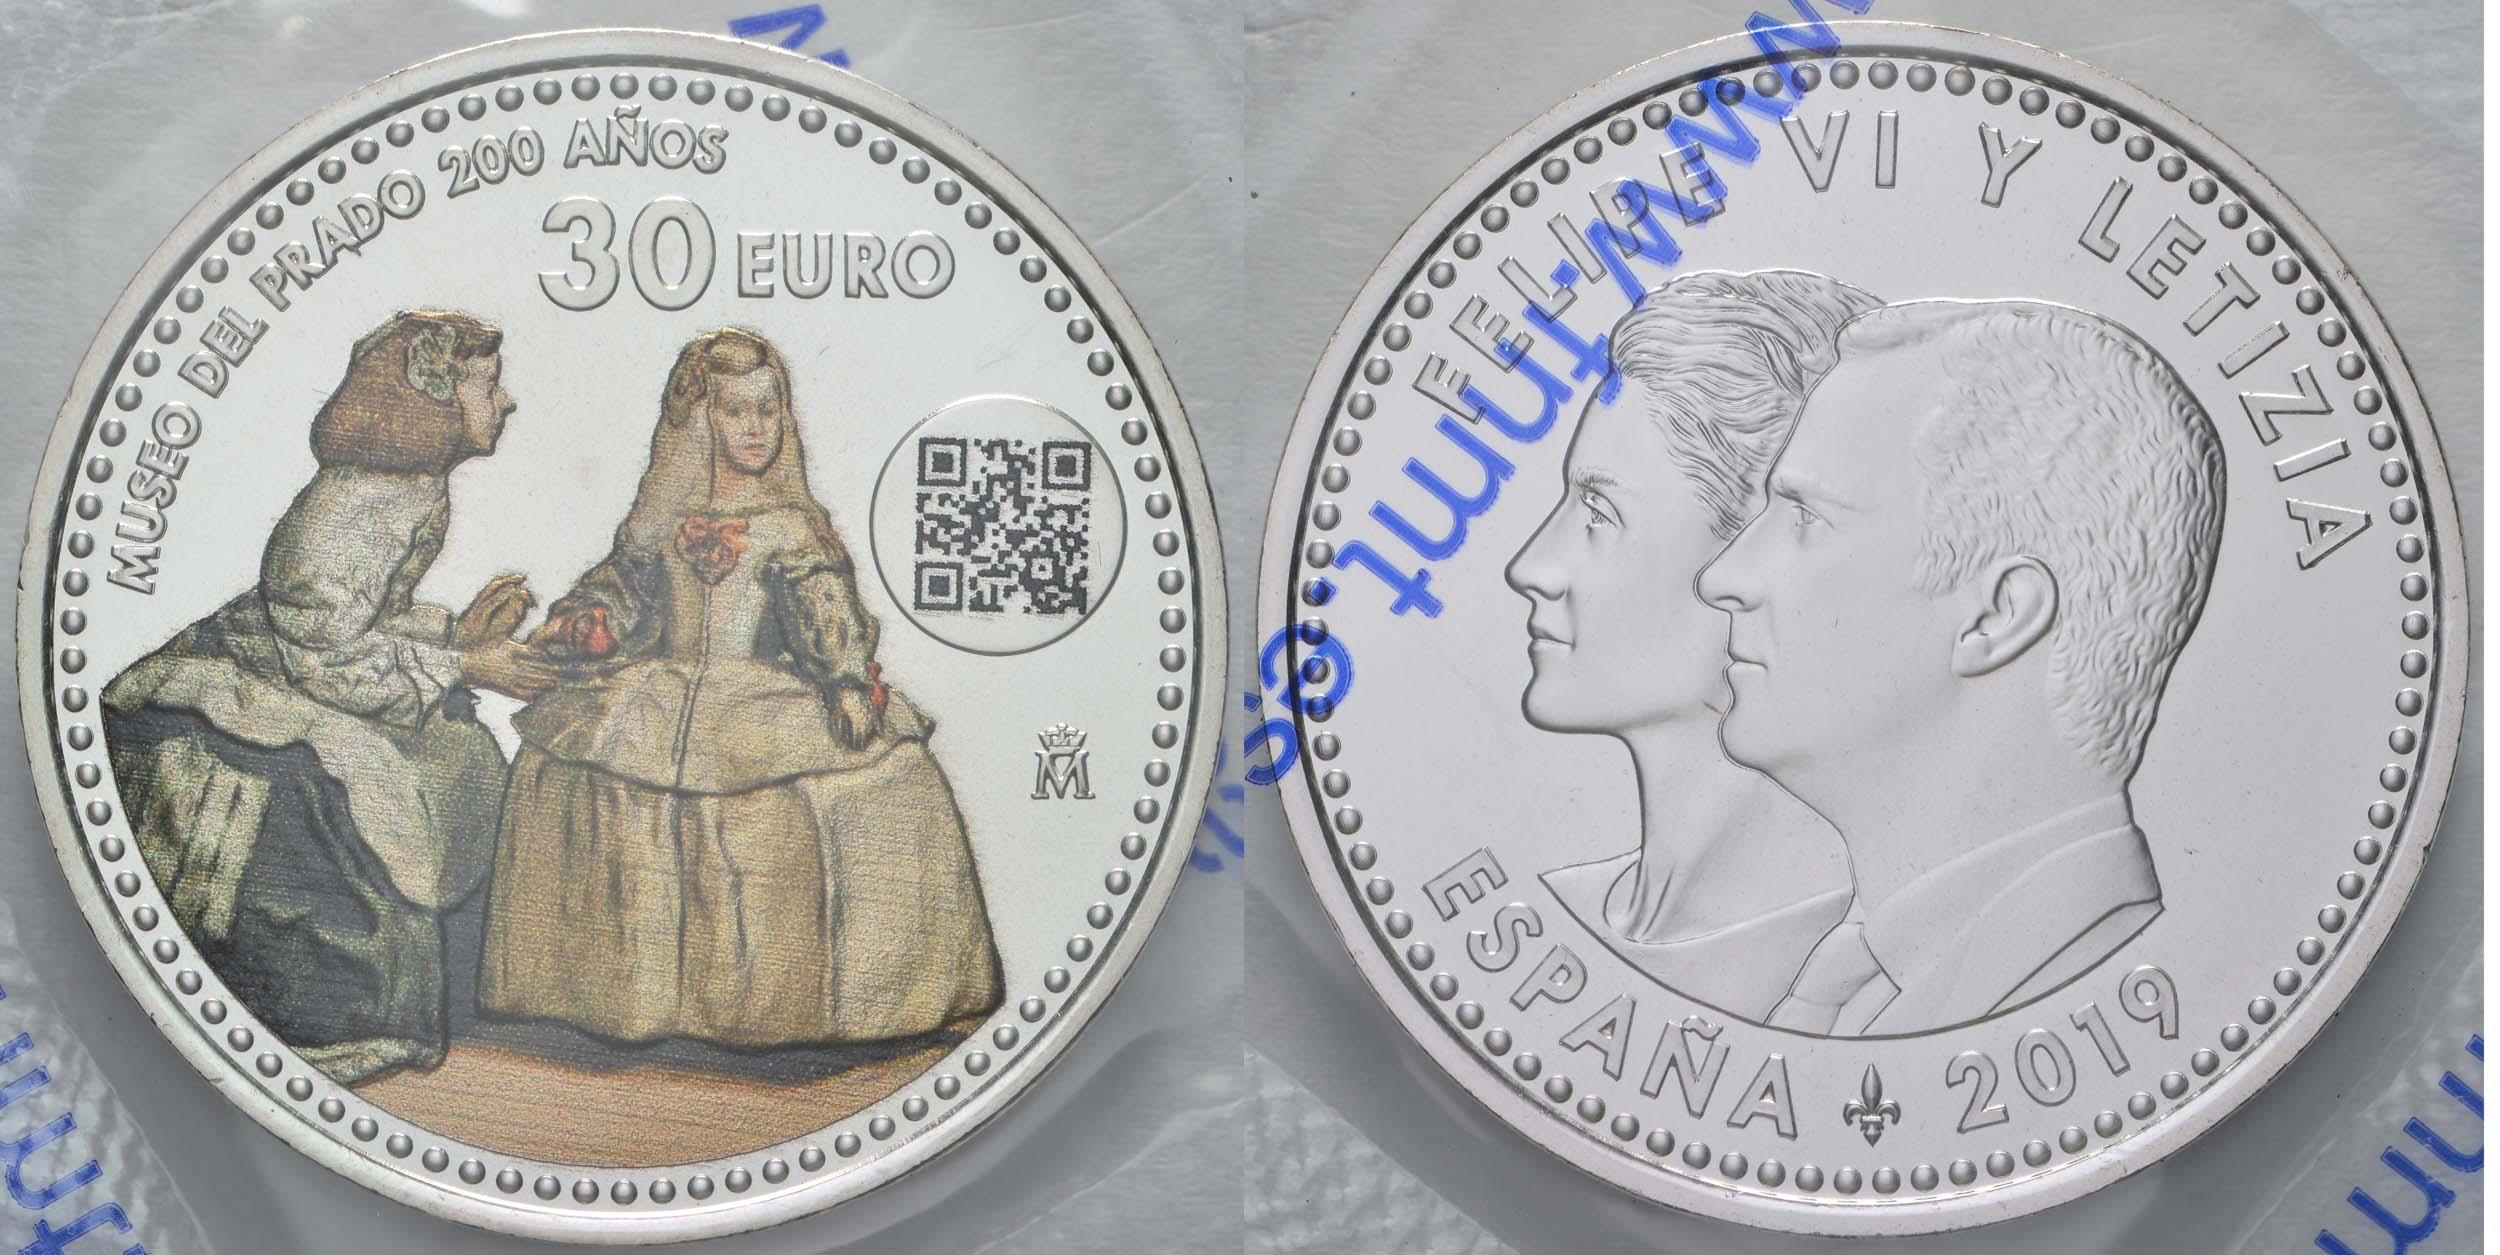 Lieferumfang:Spanien : 30 Euro 200 Jahre Prado Museum  2019 bfr